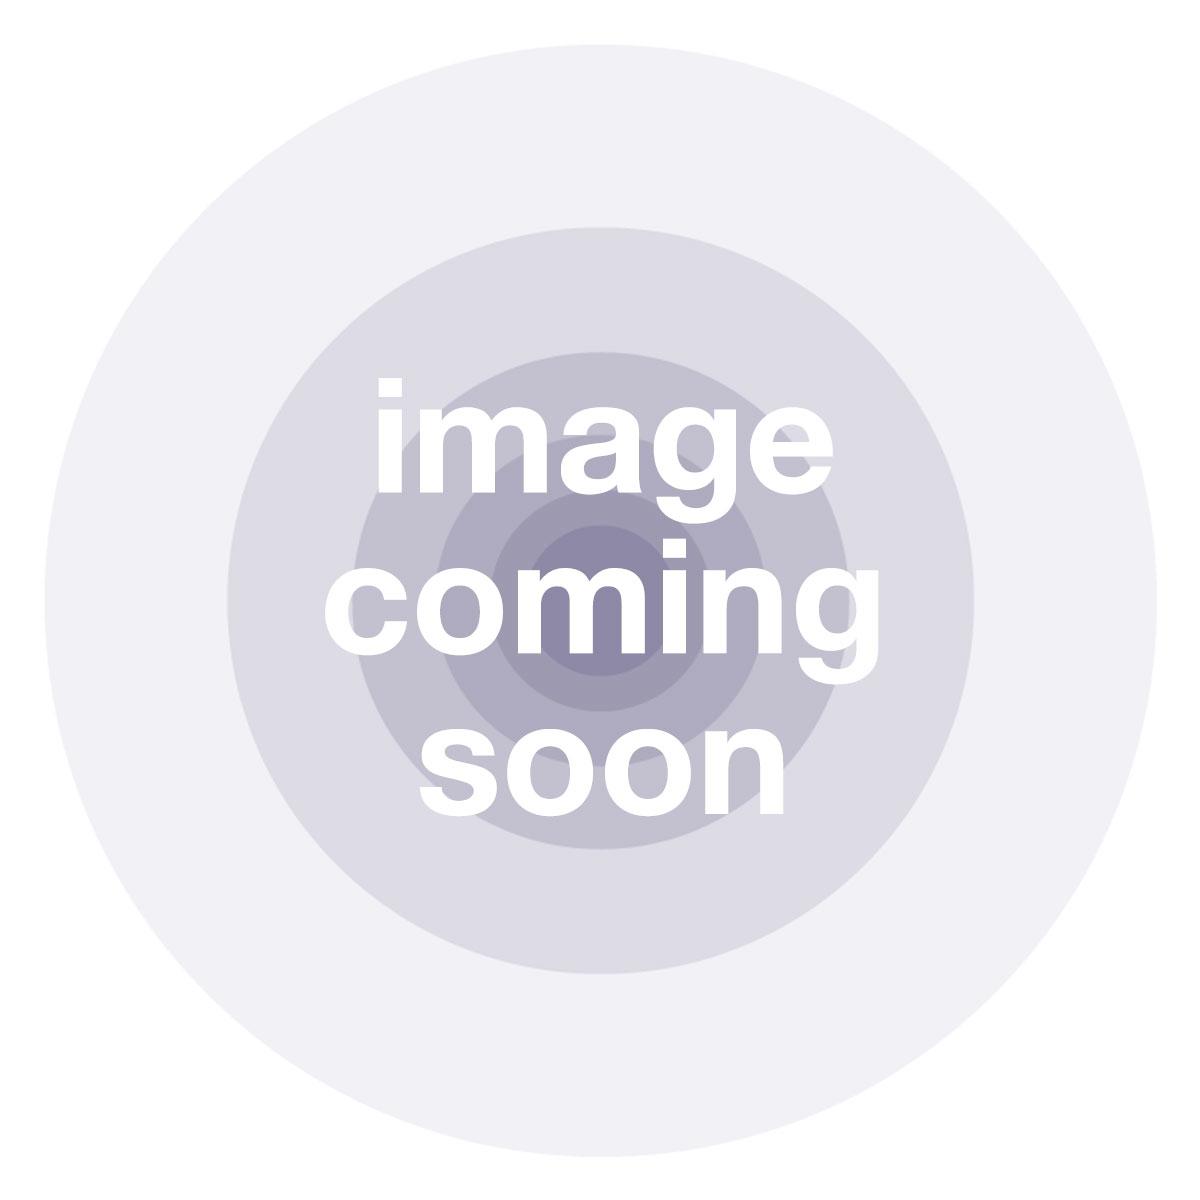 Sonnet Echo 15+ Thunderbolt Dock with DVD